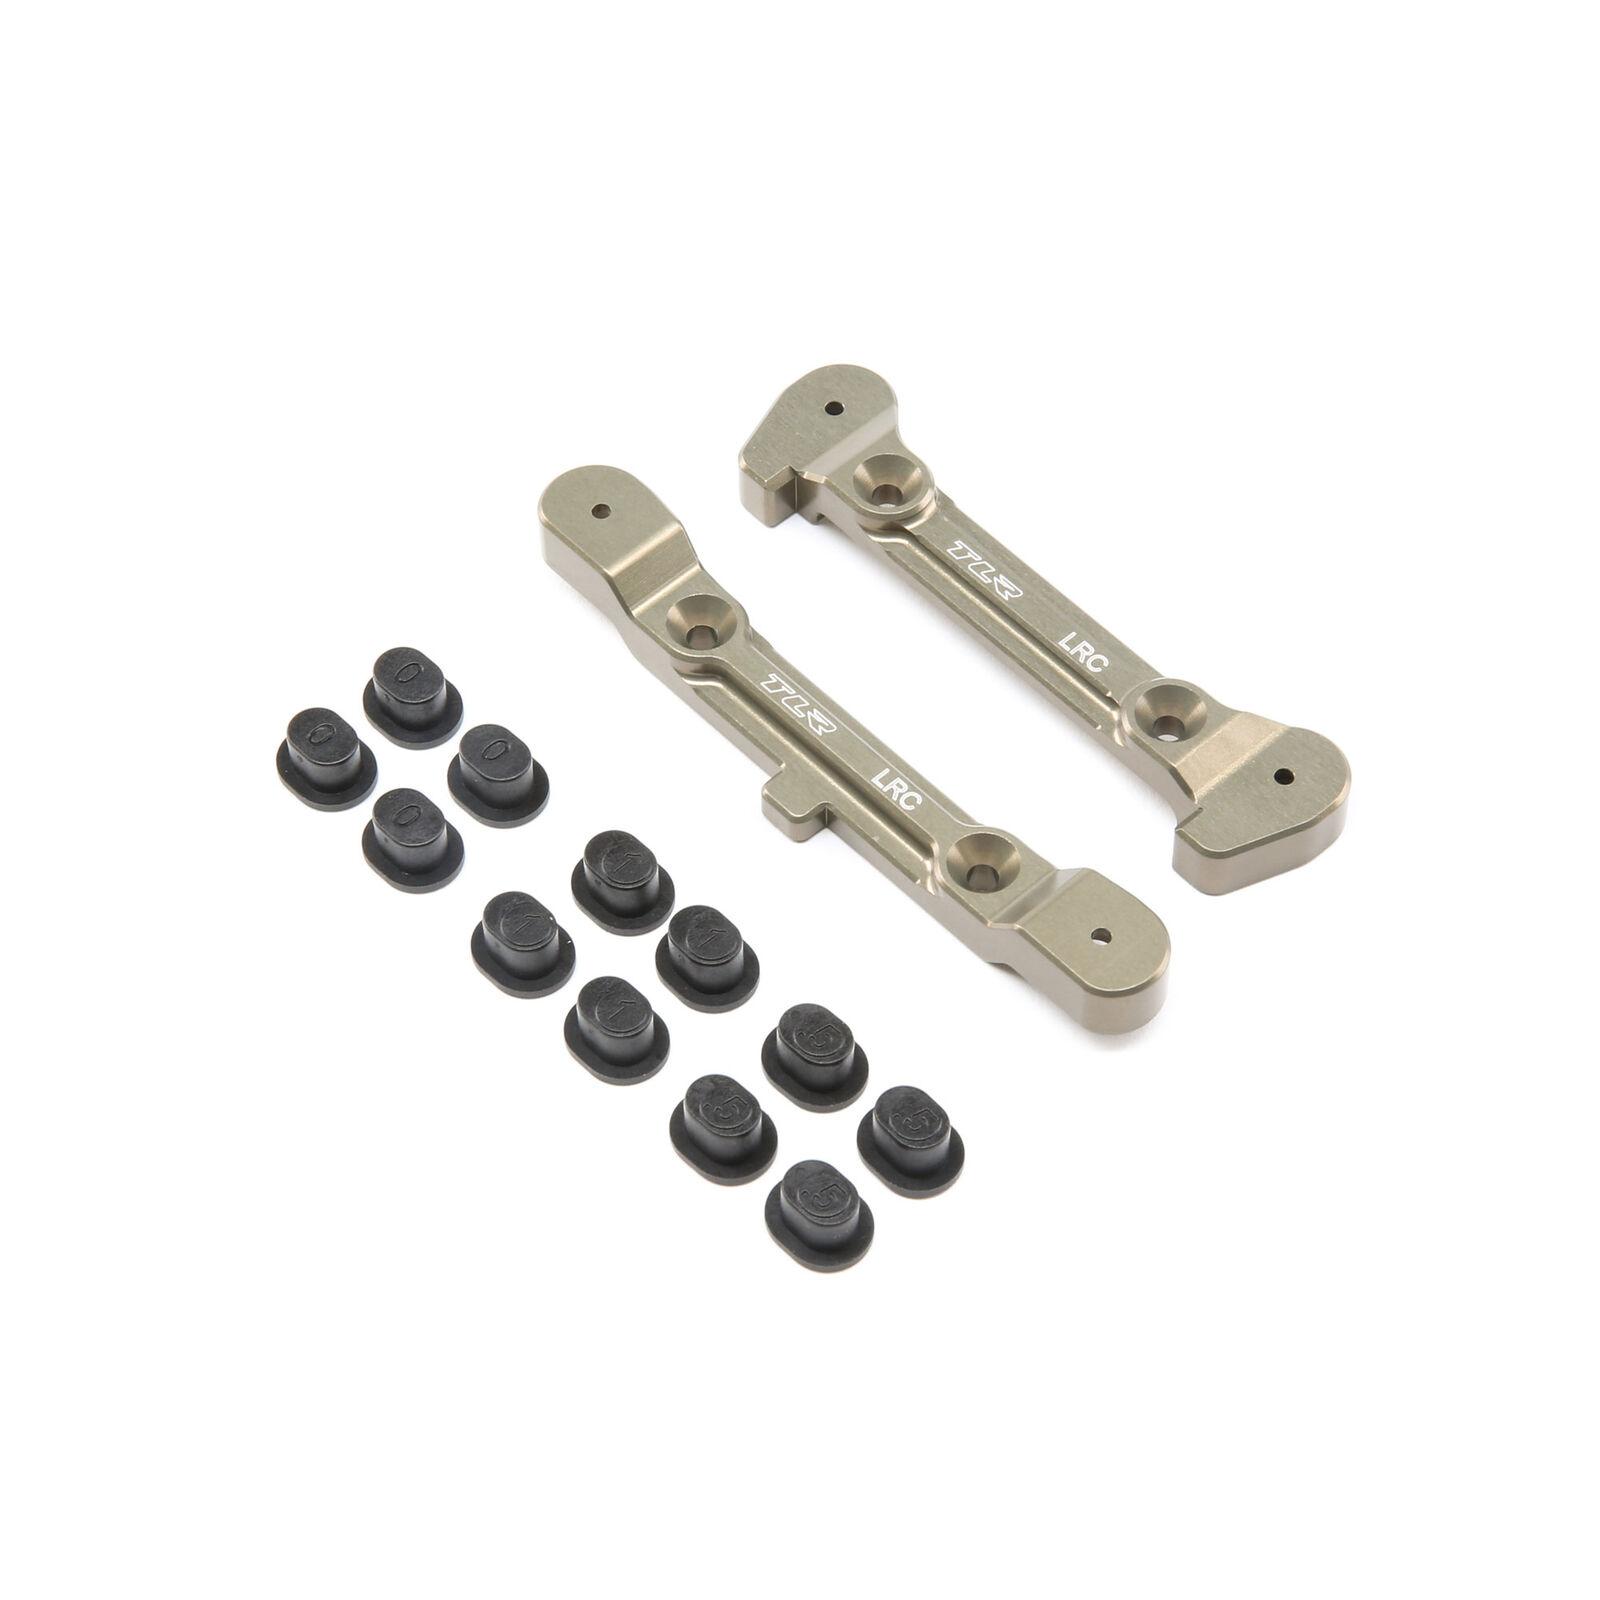 Offset Adjustable Rear Pivot Brace with Inserts: 8 4.0 Tuning Kit